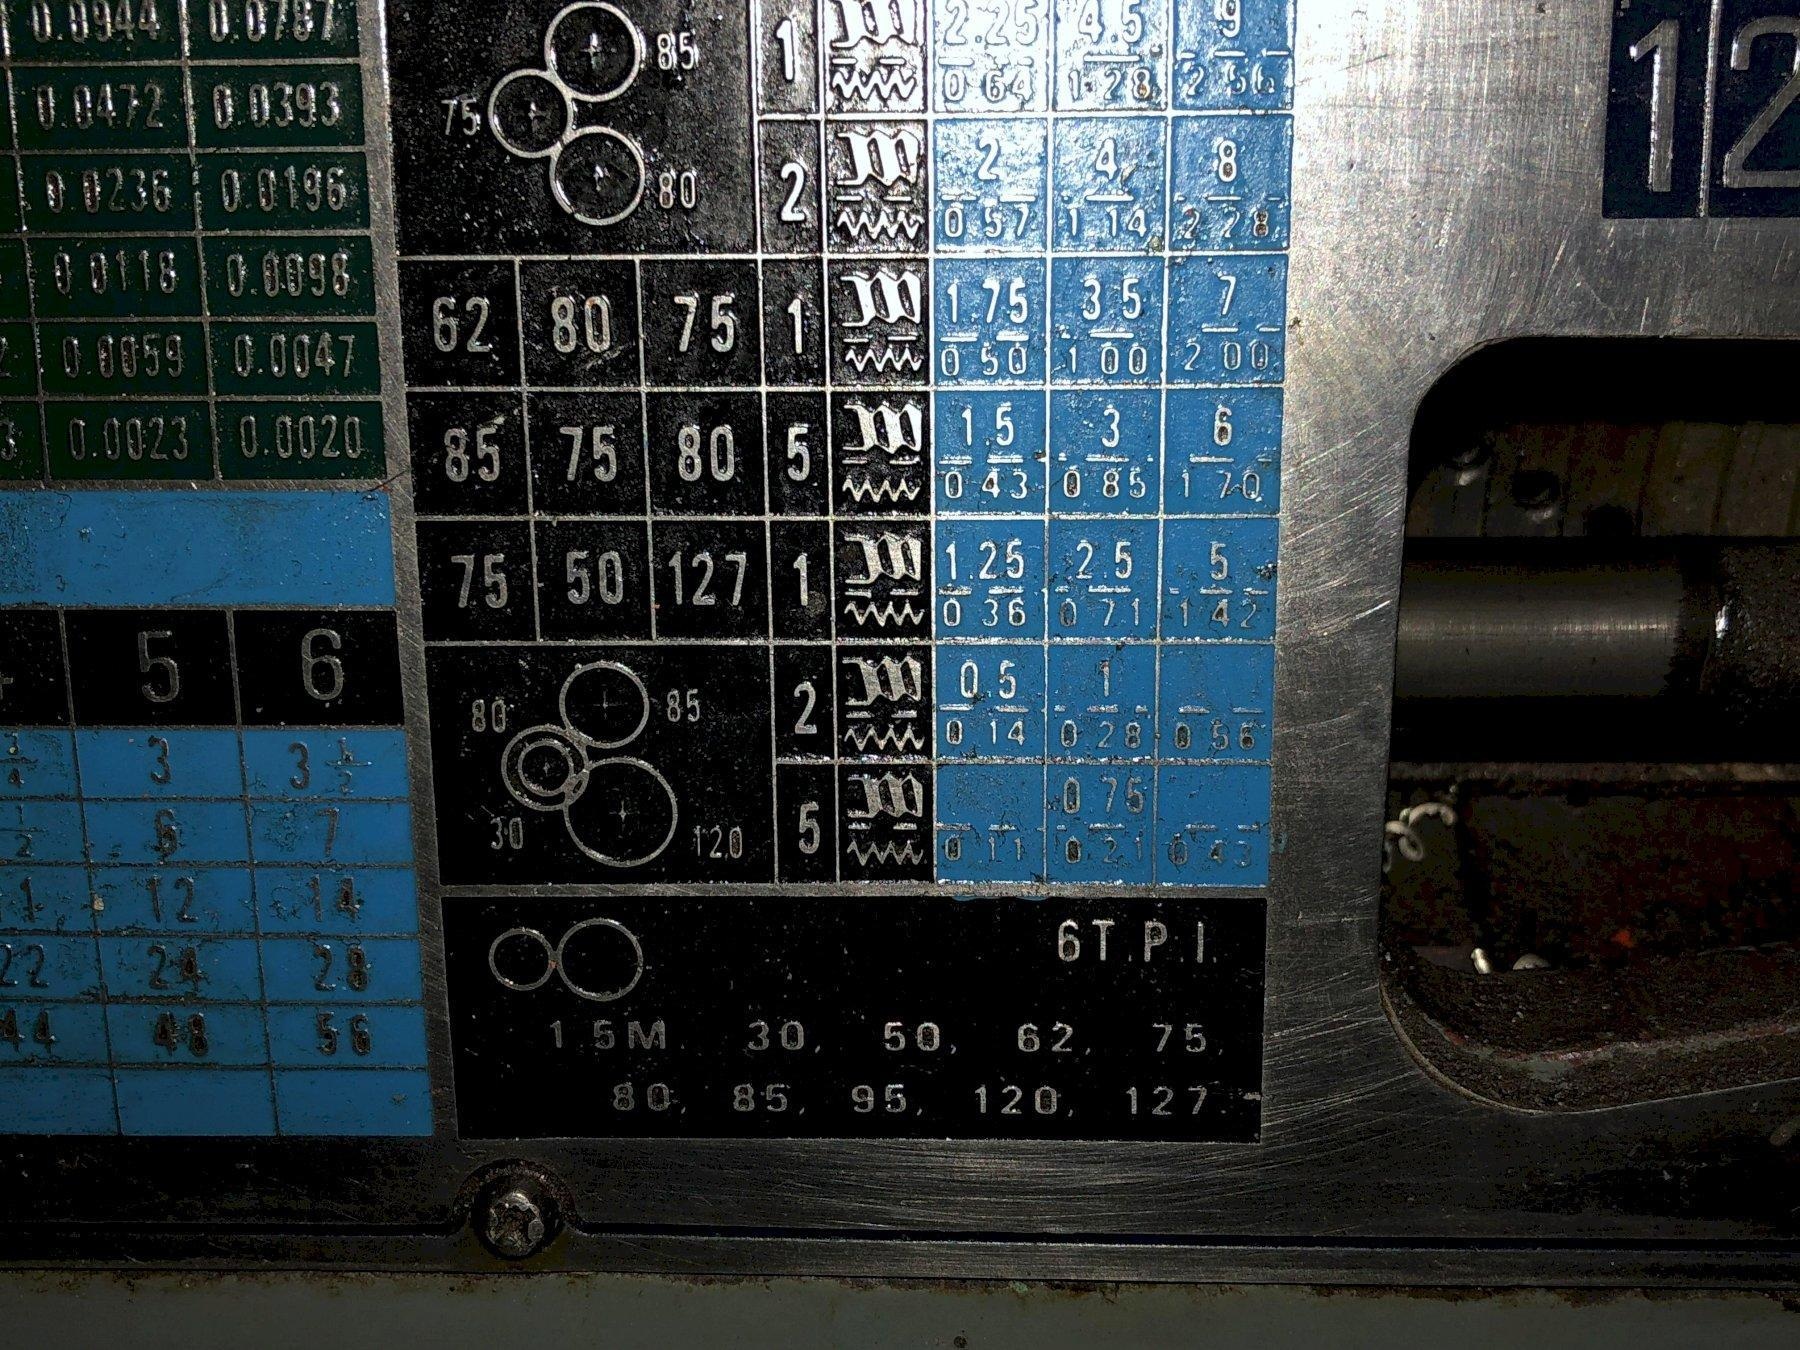 "14"" x 30"" CC, TAKISAWA WEBB ENGINE LATHE, INCH/METRIC, 8"" CHUCK"